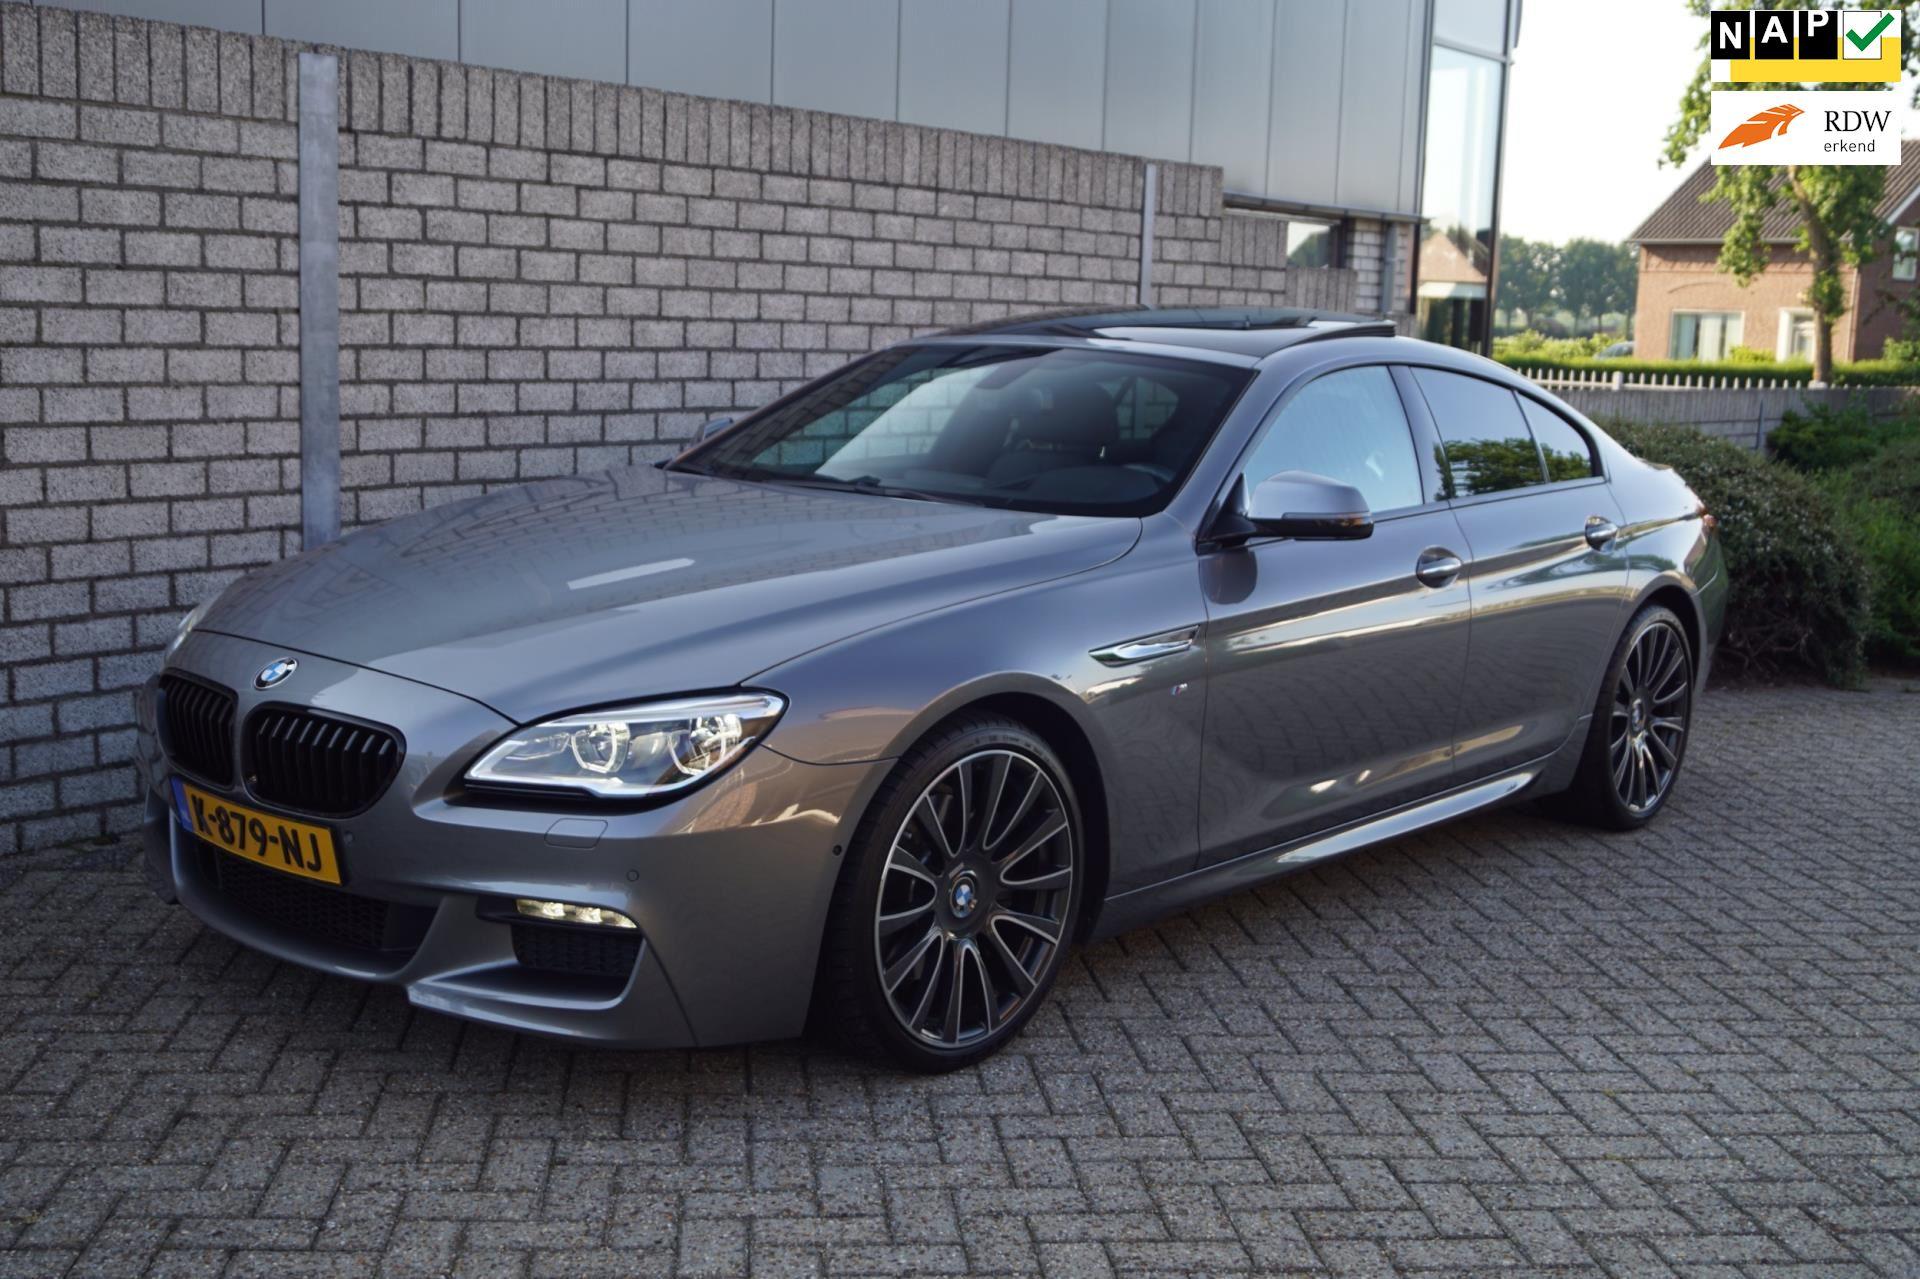 BMW 6-serie Gran Coupé occasion - Autobedrijf H. Wijdeven V.o.f.